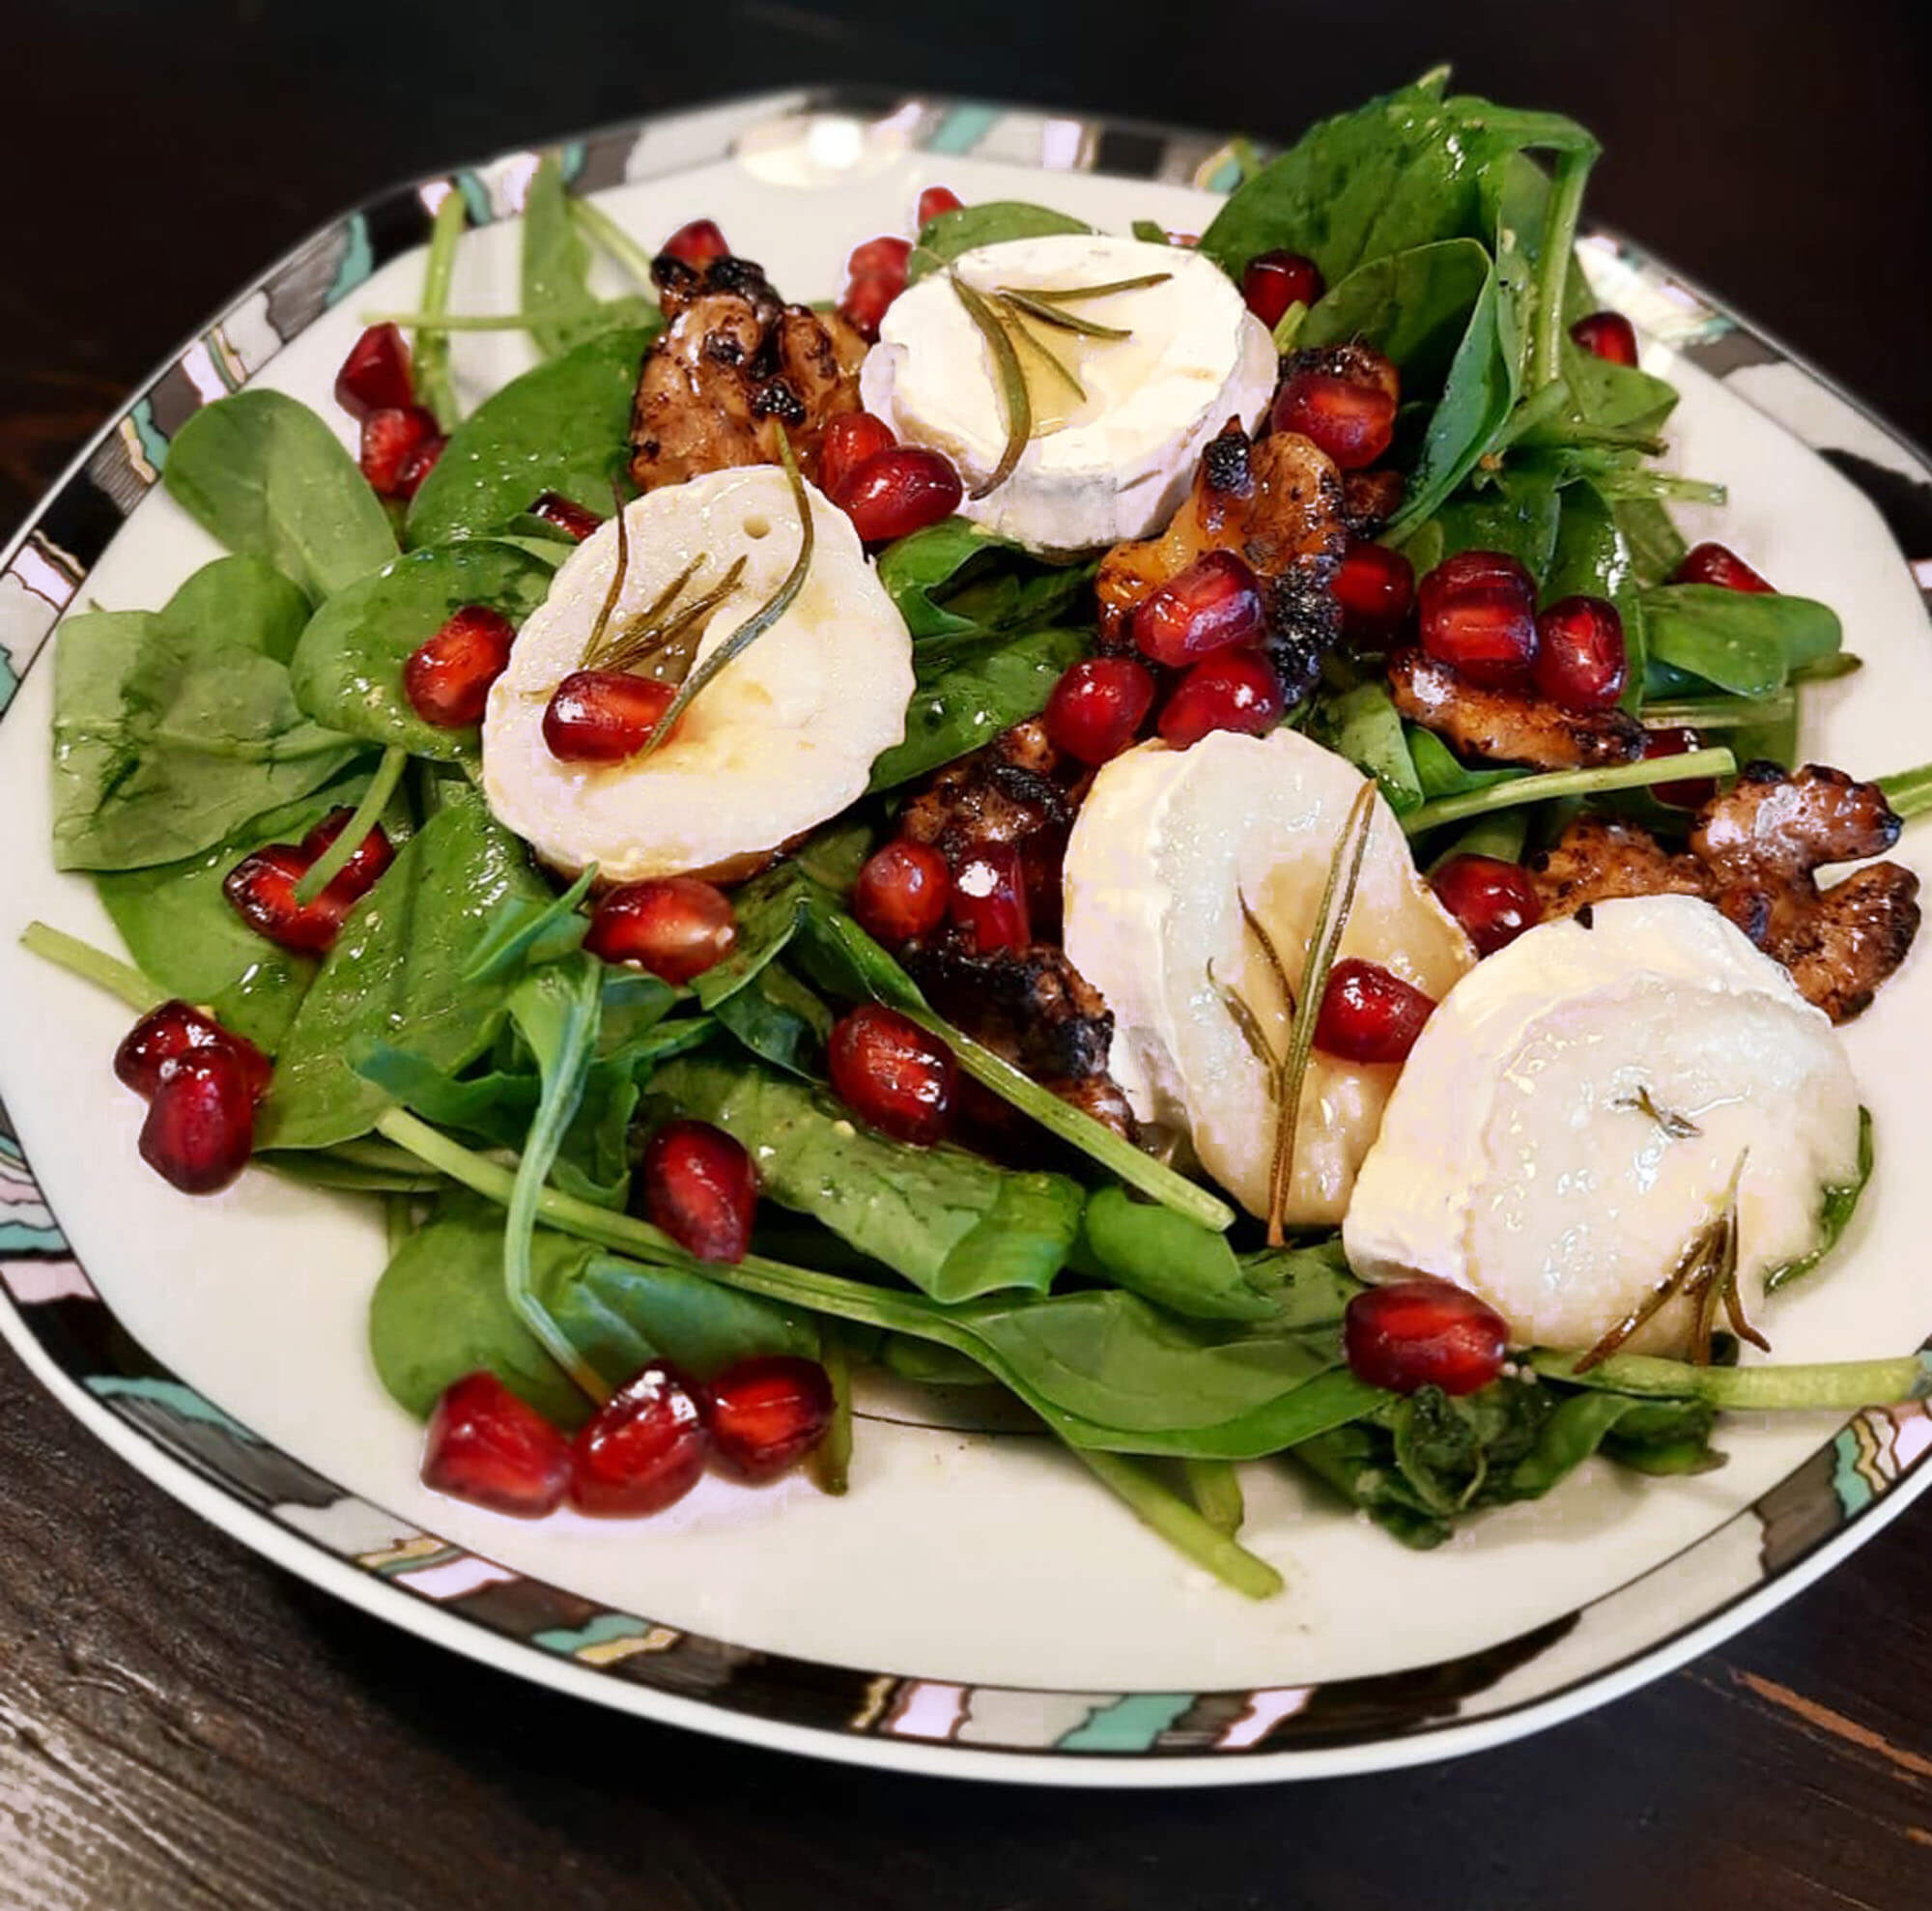 09 Spinat-Granatapfelkerne-Ziegenkäse-Salat (LT)